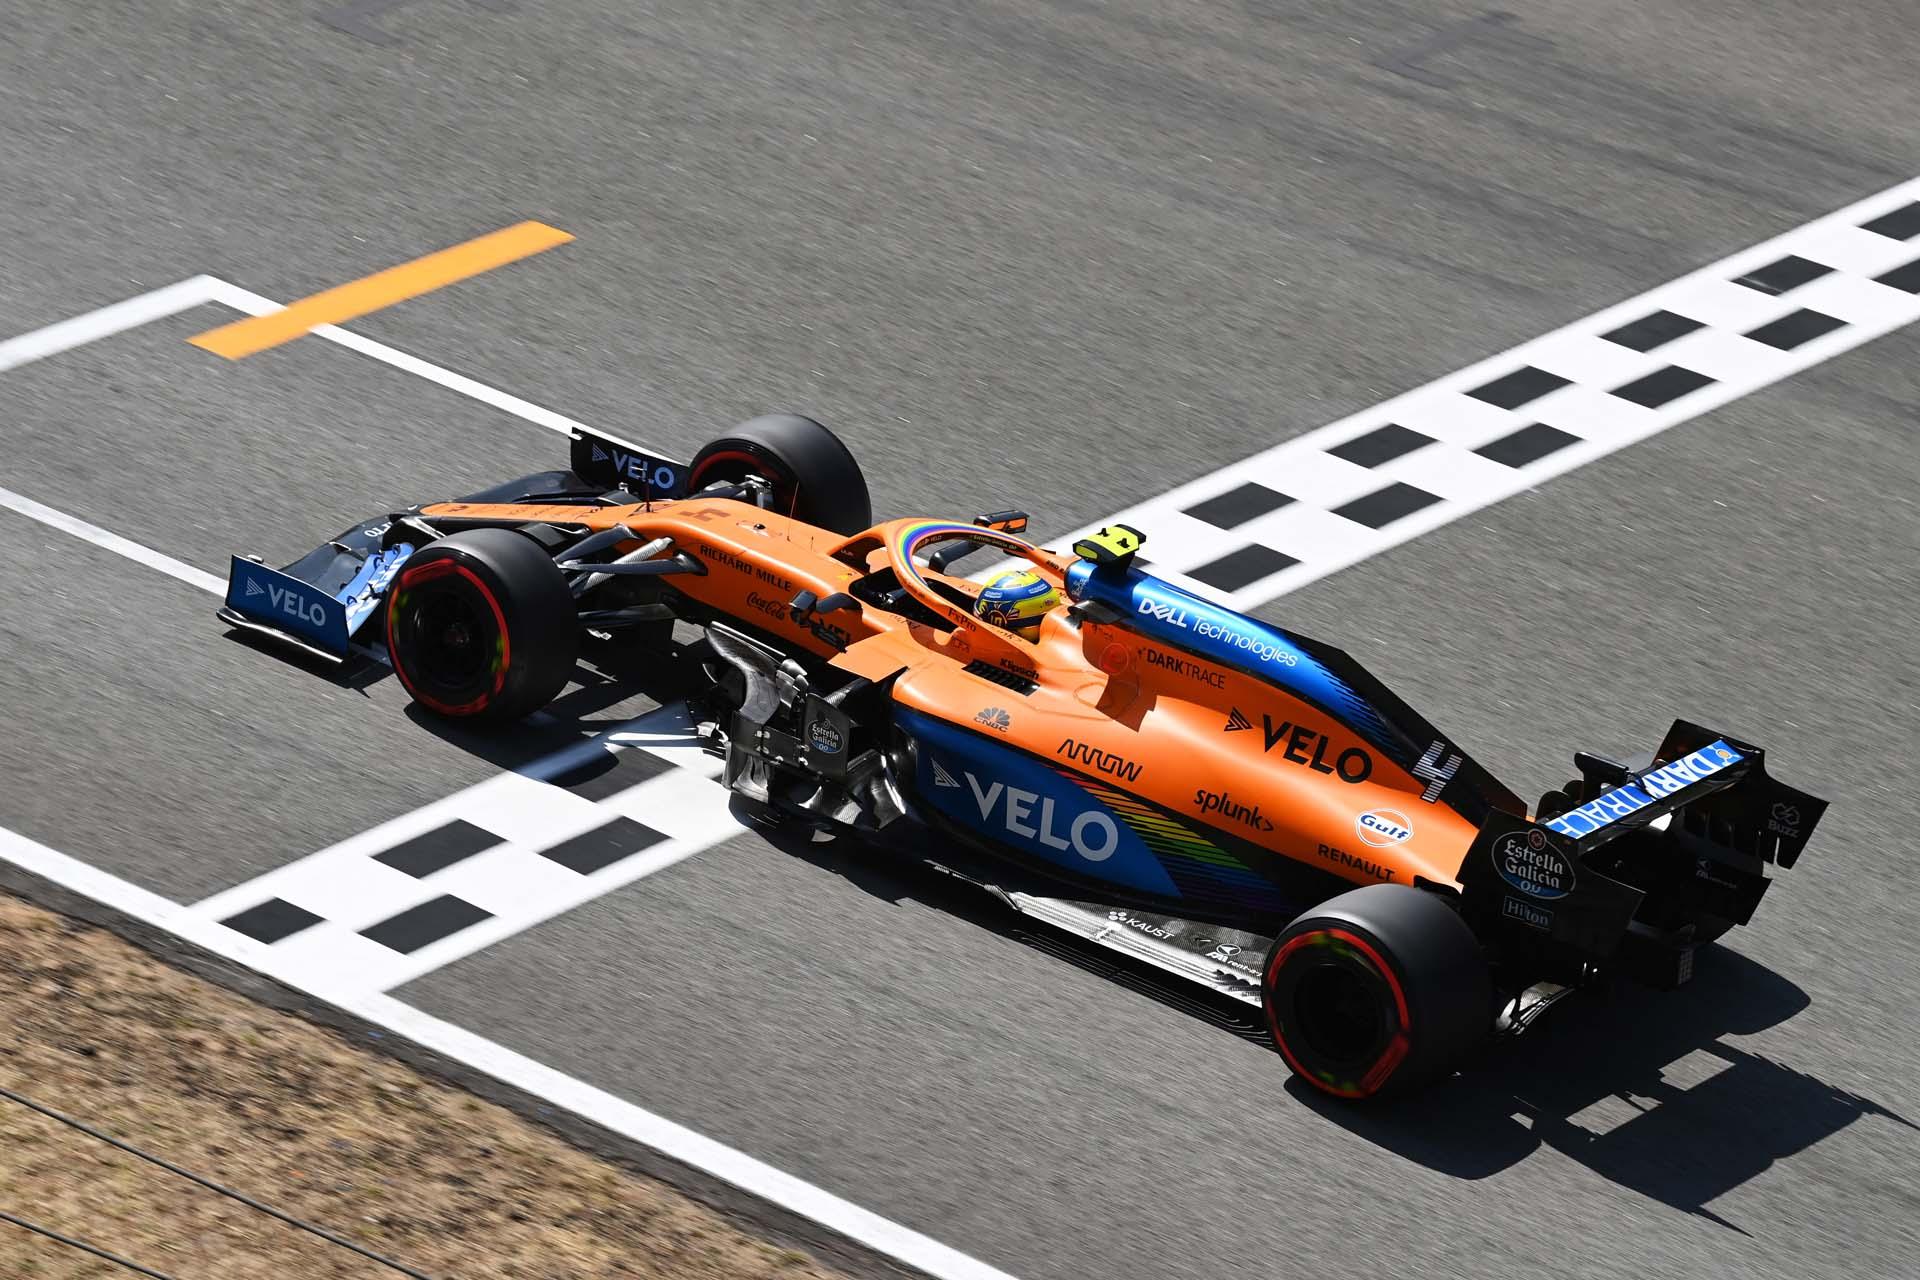 Lando Norris, McLaren MCL35, crosses the pit straight